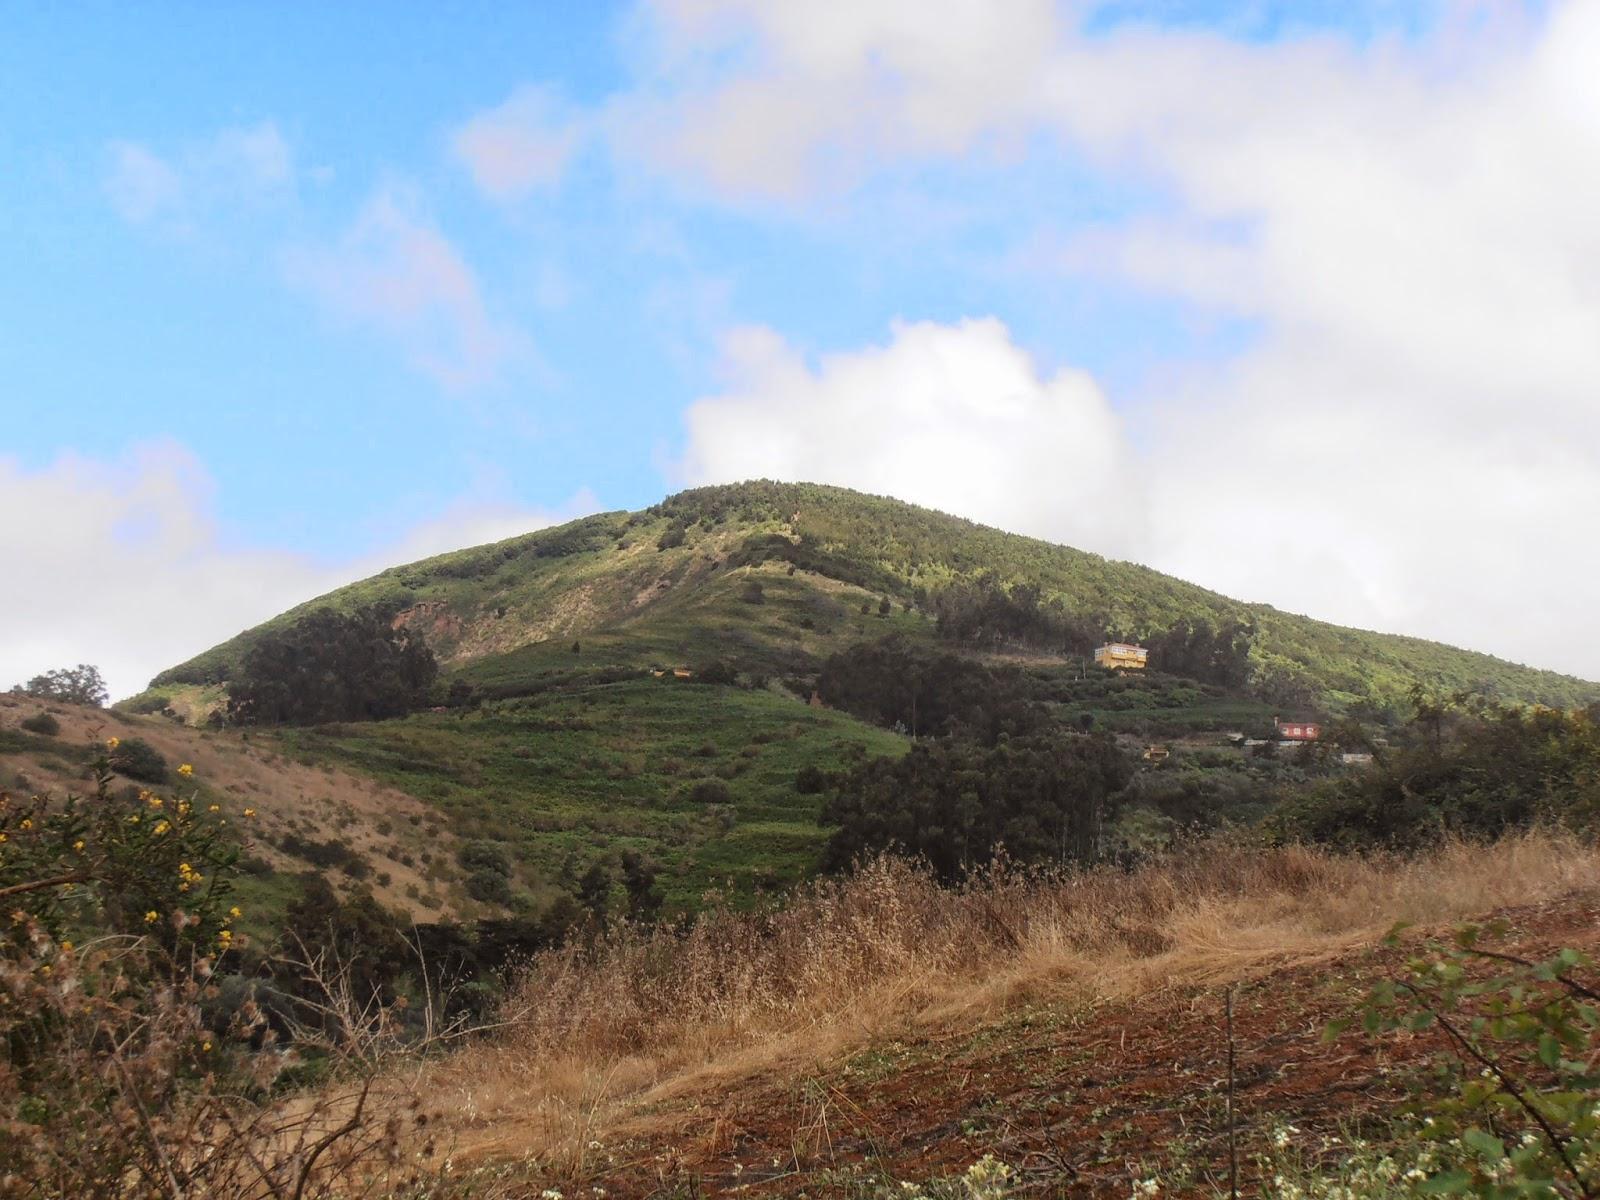 Pico de Osorio